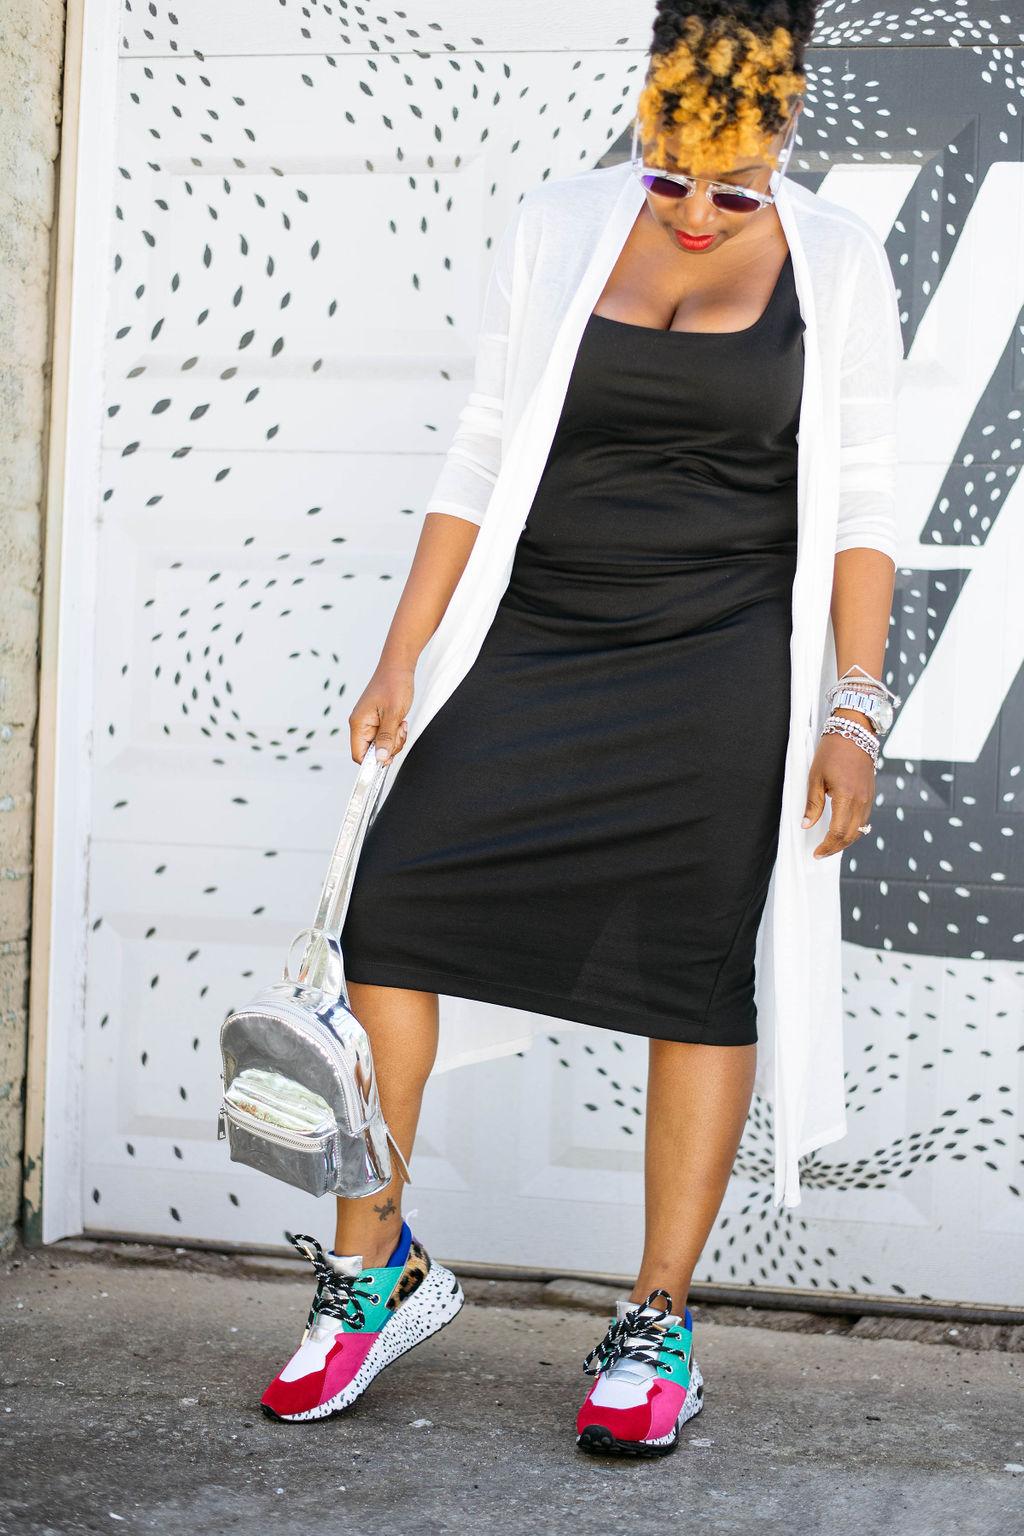 Atlanta personal stylist, Top Atlanta blogger, melodiestewart.com, sneakers street style